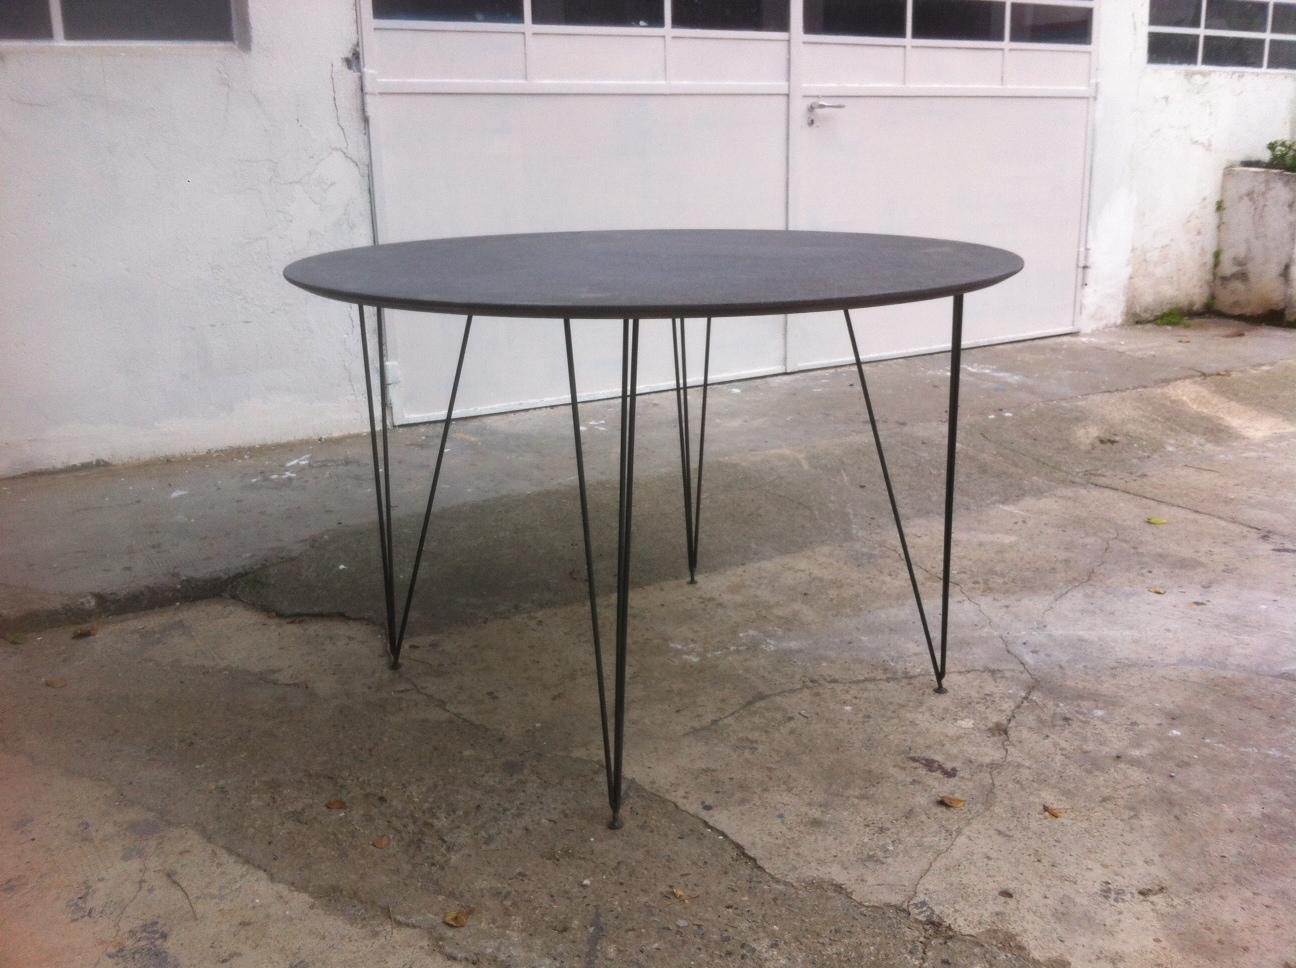 Officine catena tavolo rotondo diametro 120 cm for Tavolo rotondo 120 cm